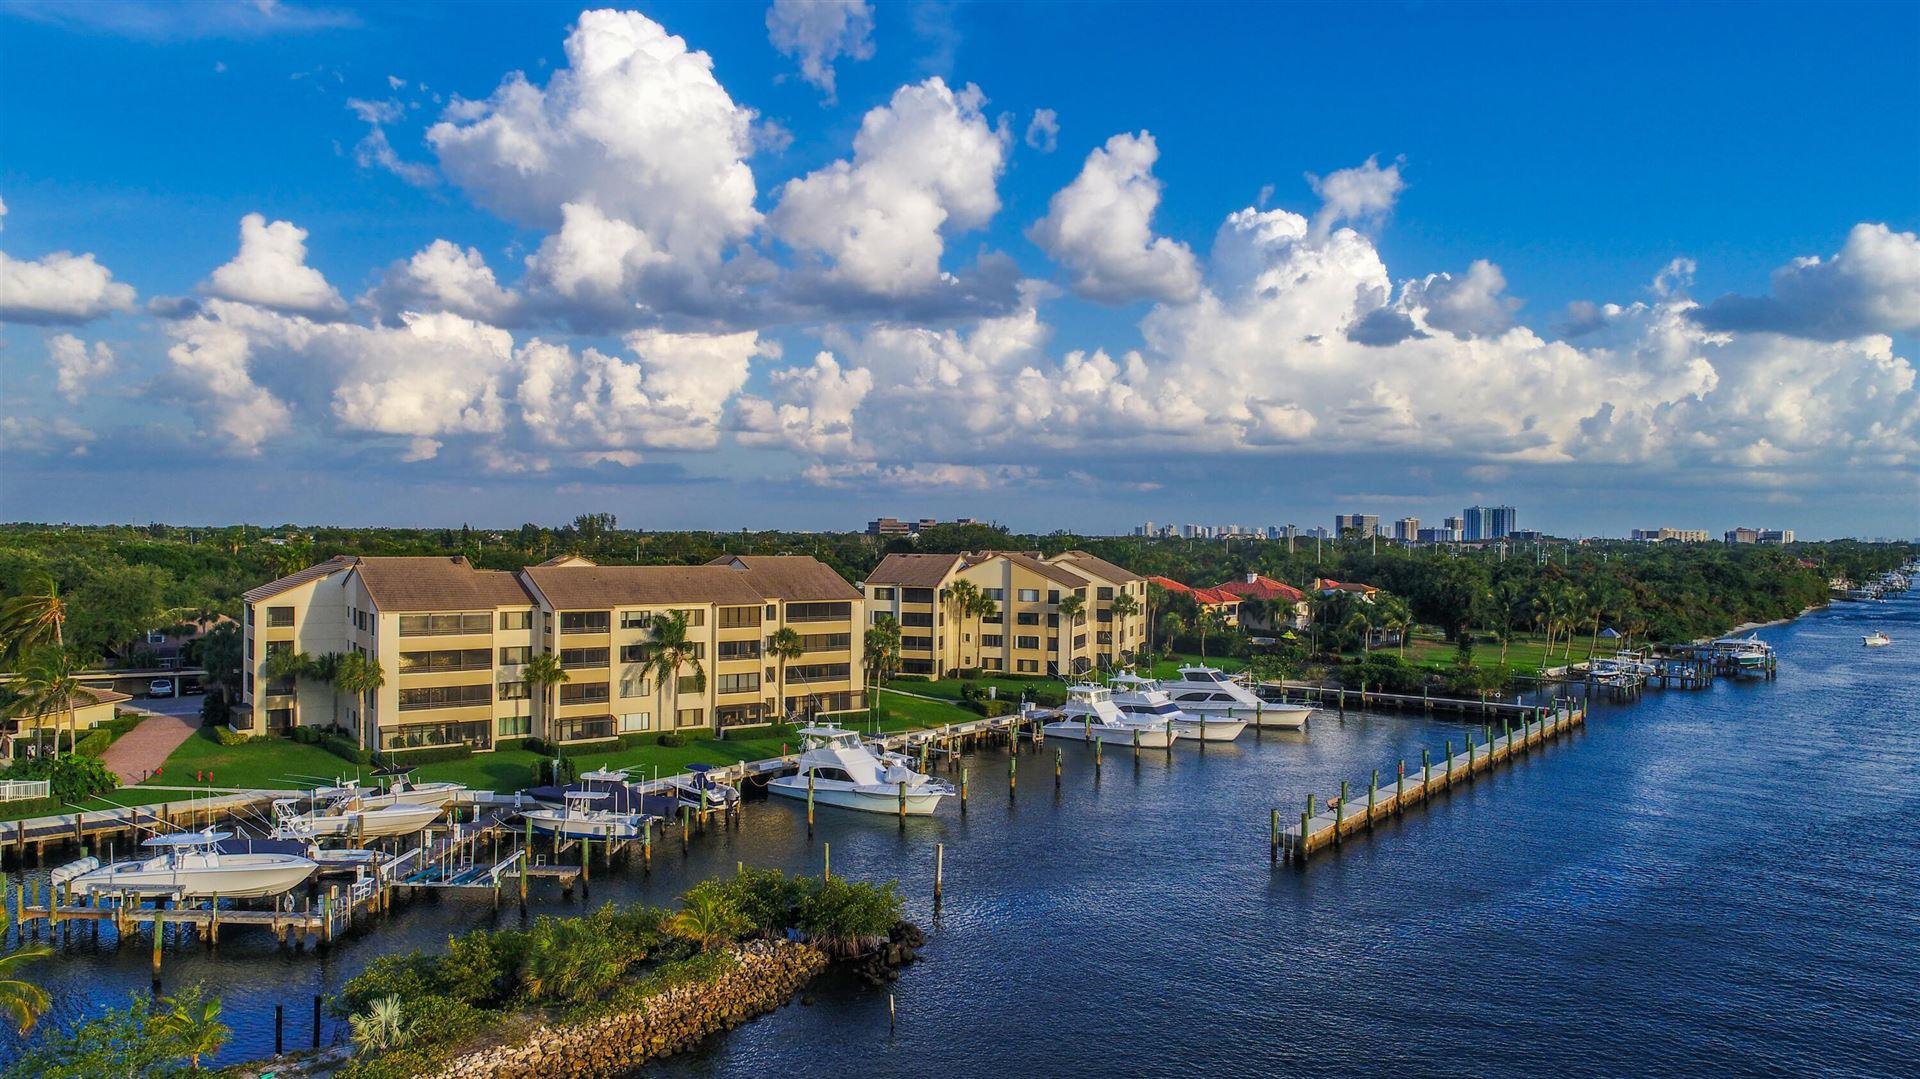 Photo for 934 Oak Harbour Drive #934, Juno Beach, FL 33408 (MLS # RX-10739942)